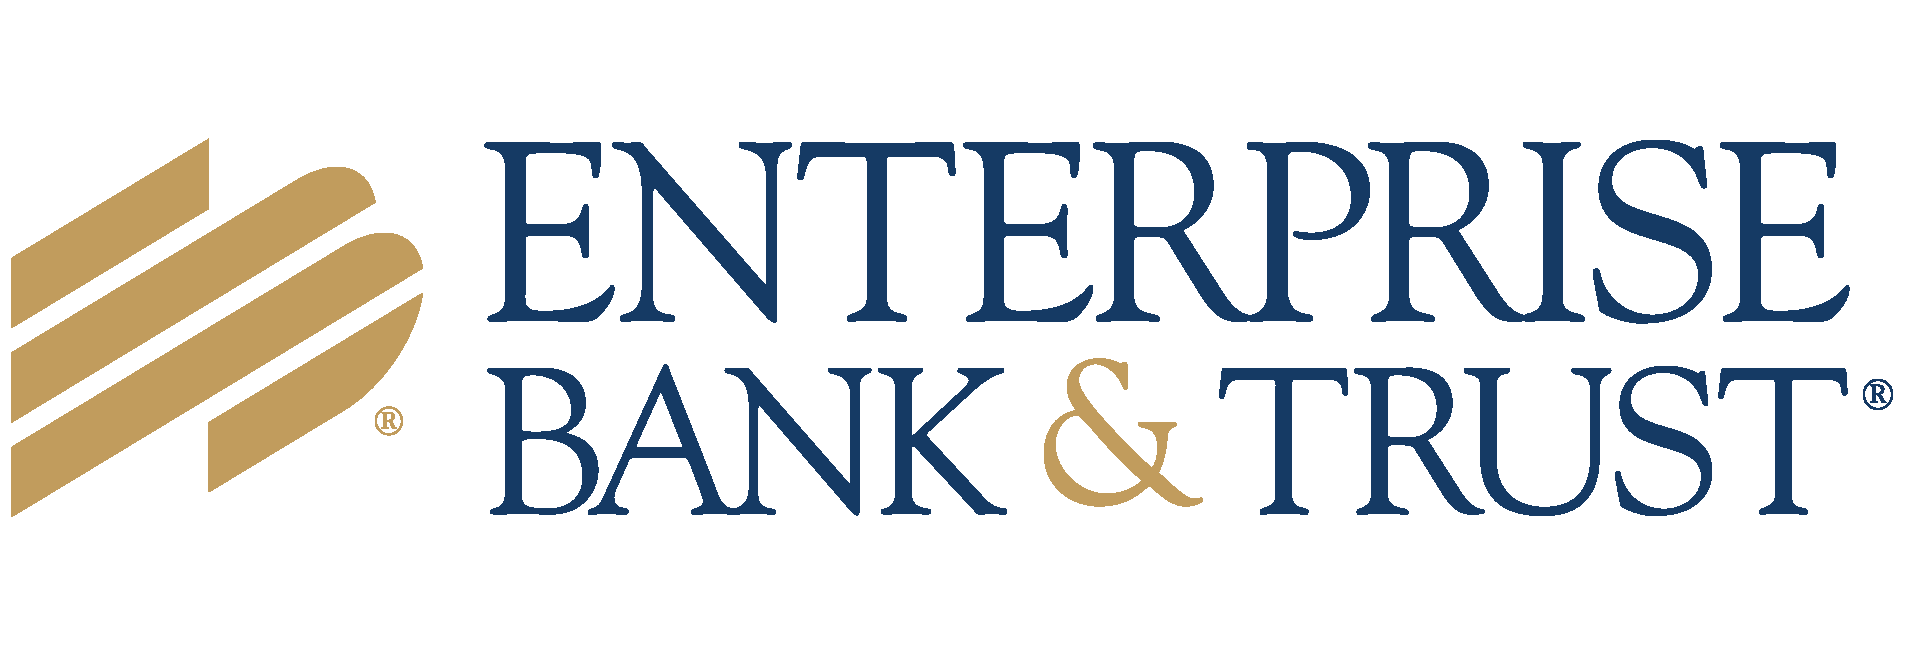 Enterprise Bank & Trust